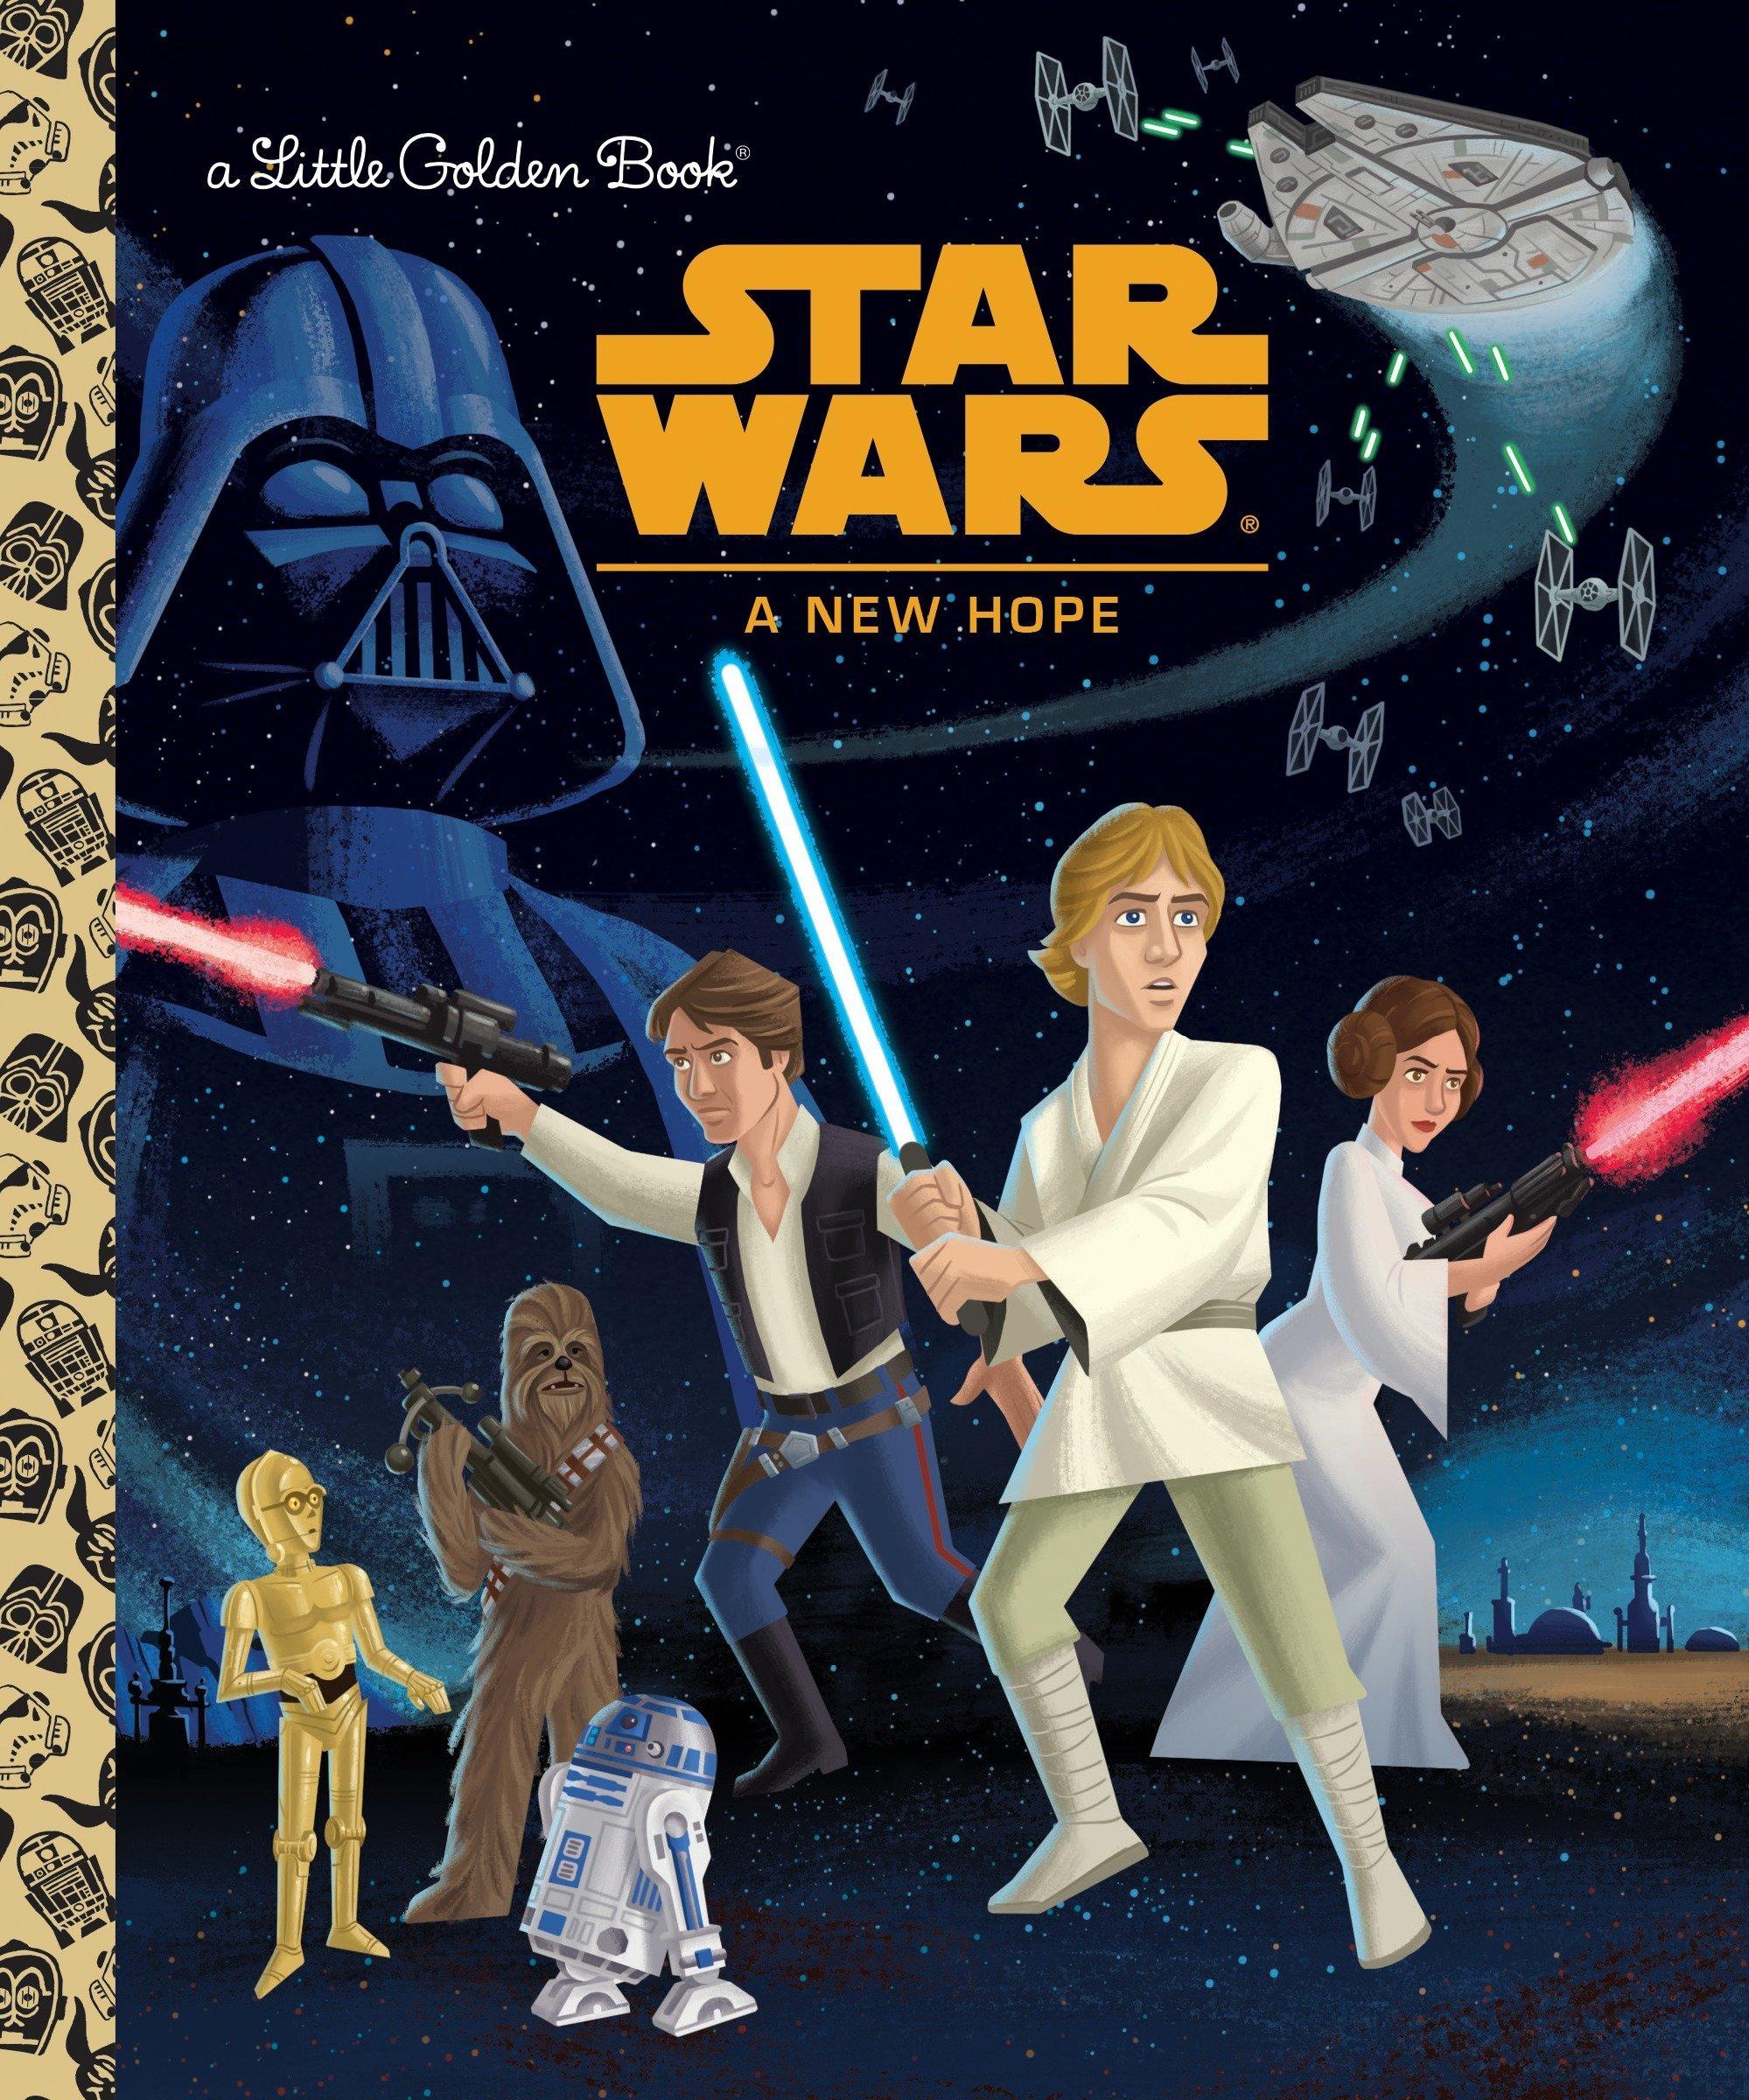 Star Wars: A New Hope (Star Wars) (Little Golden Book): Geof Smith, Caleb  Meurer, Micky Rose: 9780736435383: Amazon.com: Books